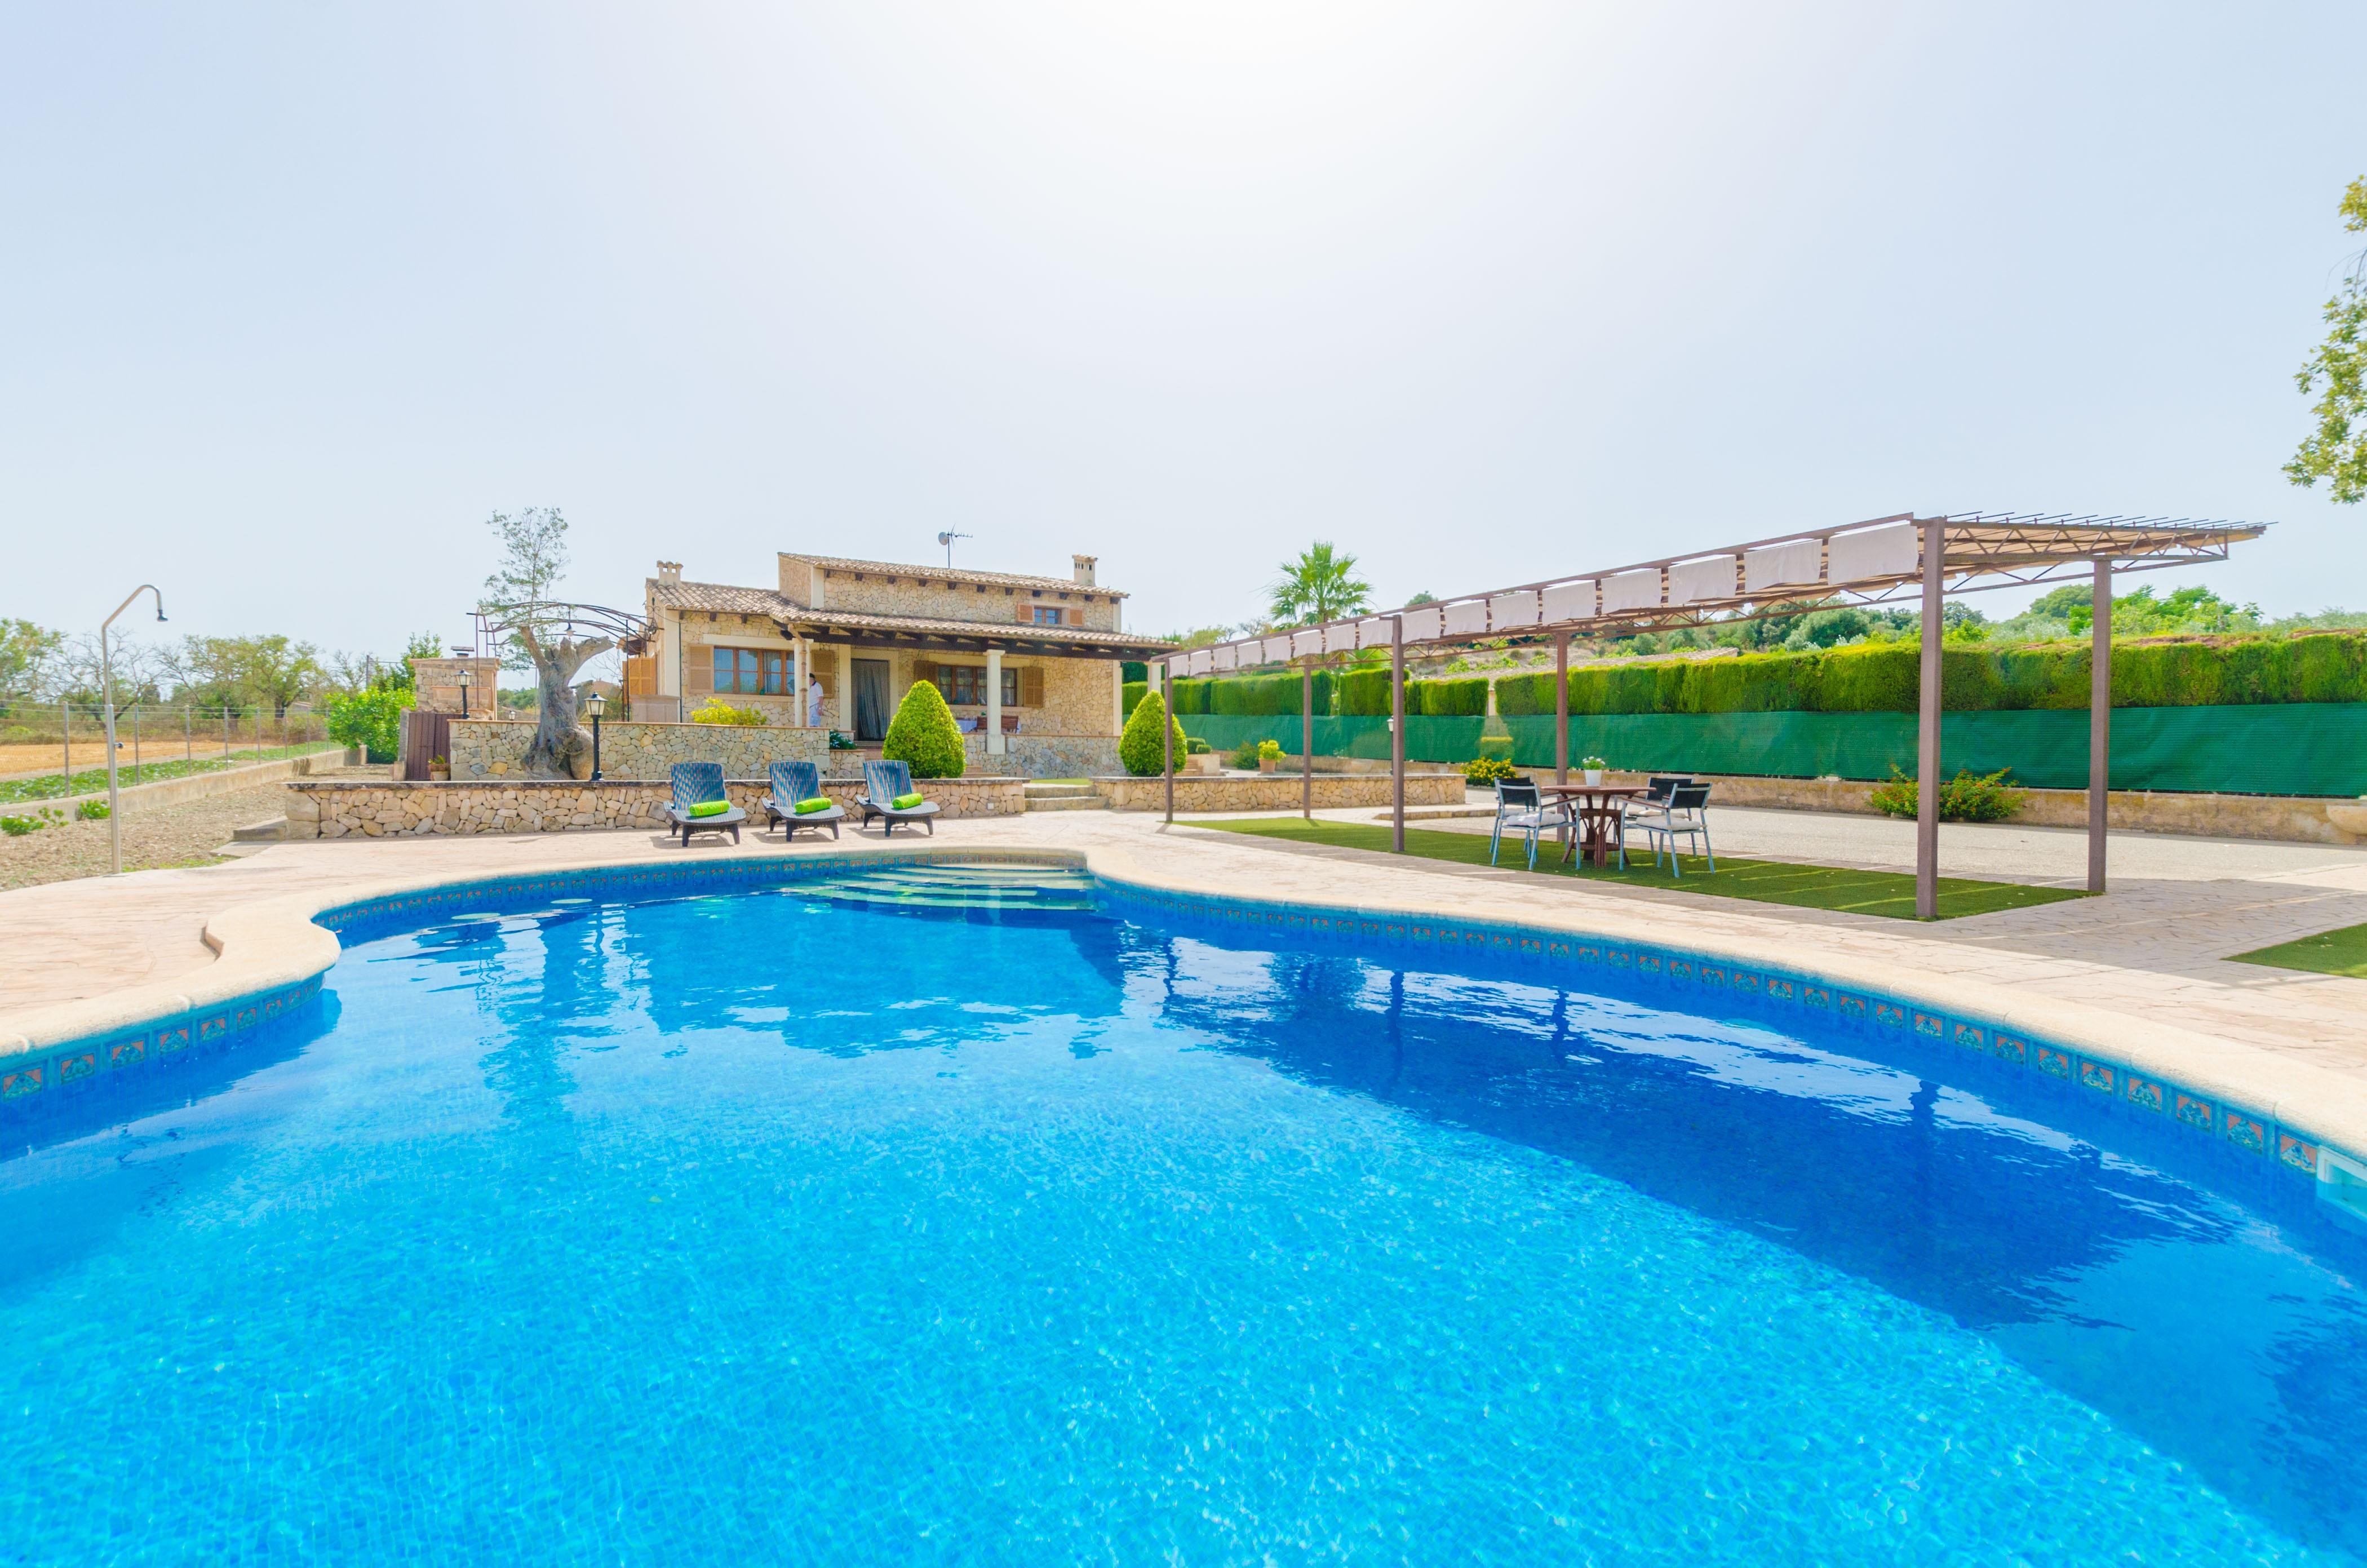 Maison de vacances SA SINIA (2374876), Lloret de Vistalegre, Majorque, Iles Baléares, Espagne, image 41